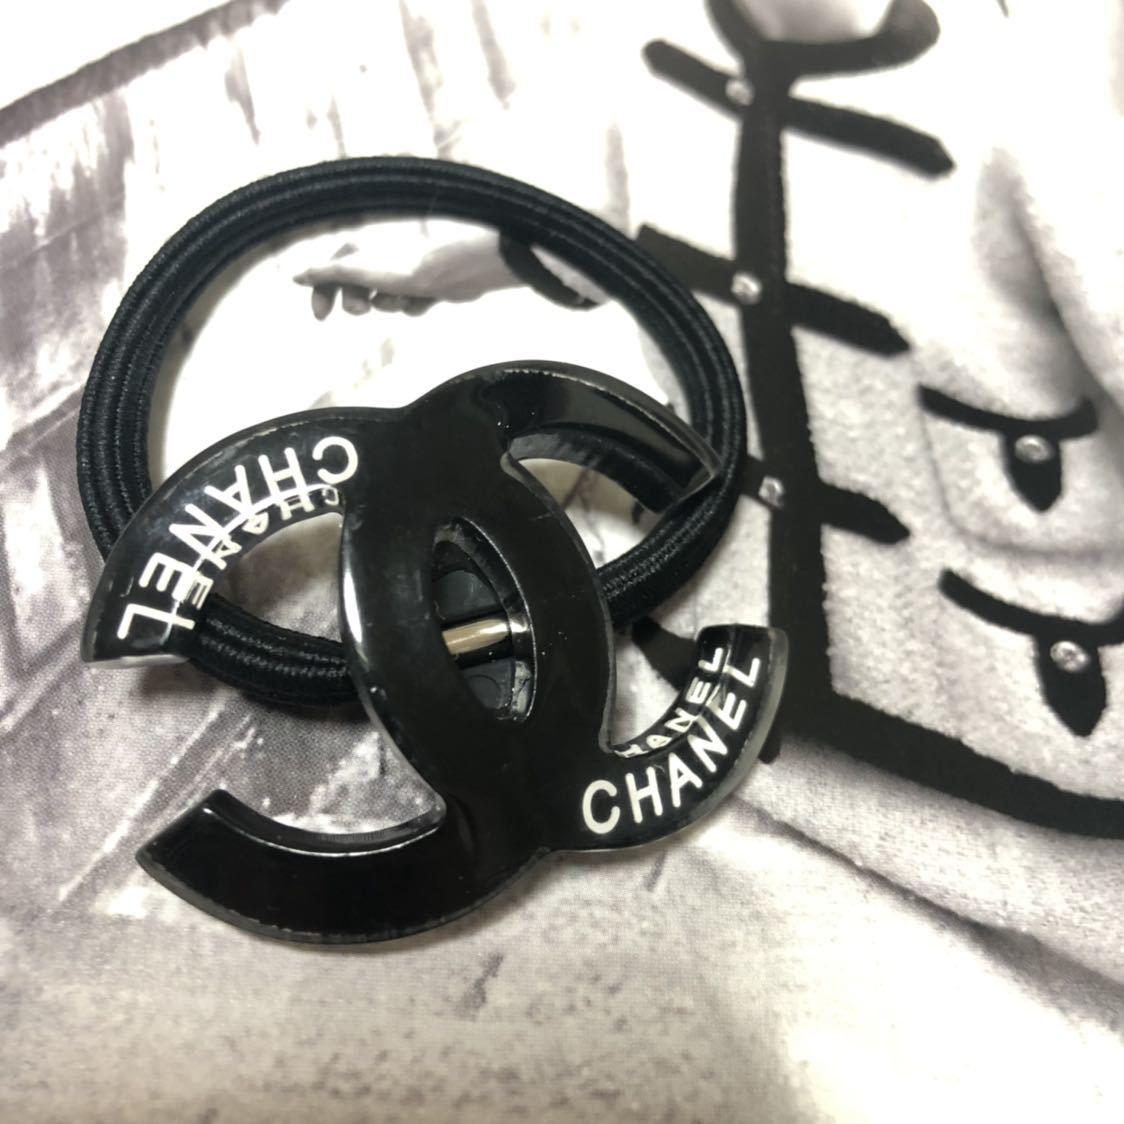 e62df2937f9b 代購代標第一品牌- 樂淘letao - CHANEL シャネルヘアゴム☆ノベルティー ...